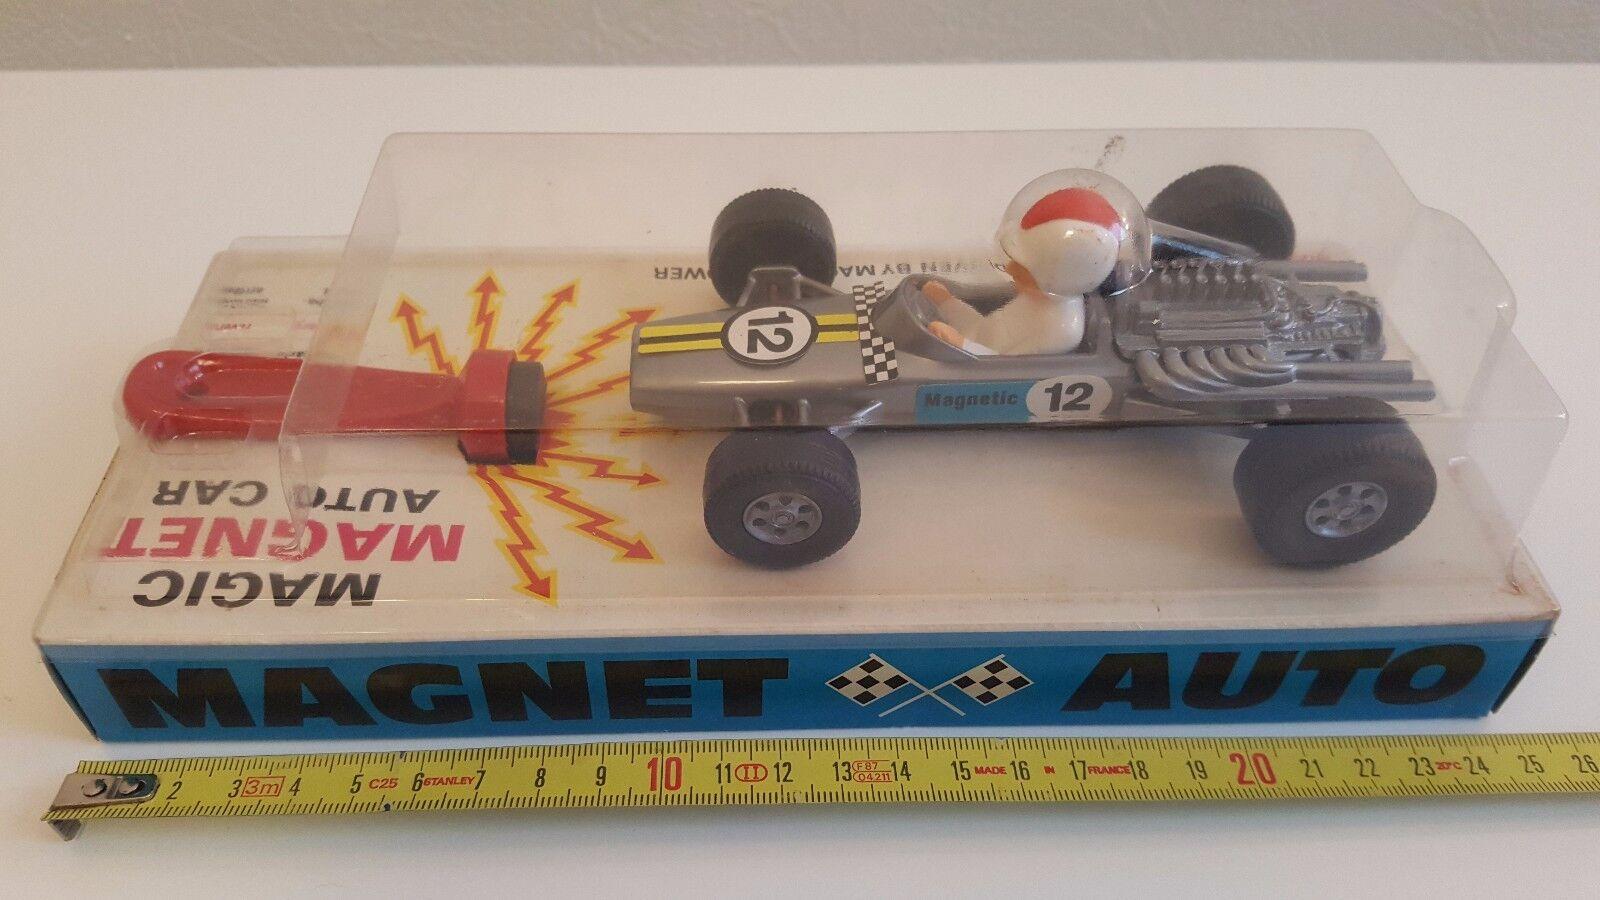 Magneto w (deutschland) - magic - magnet auto f1 en bo î te jahrgang